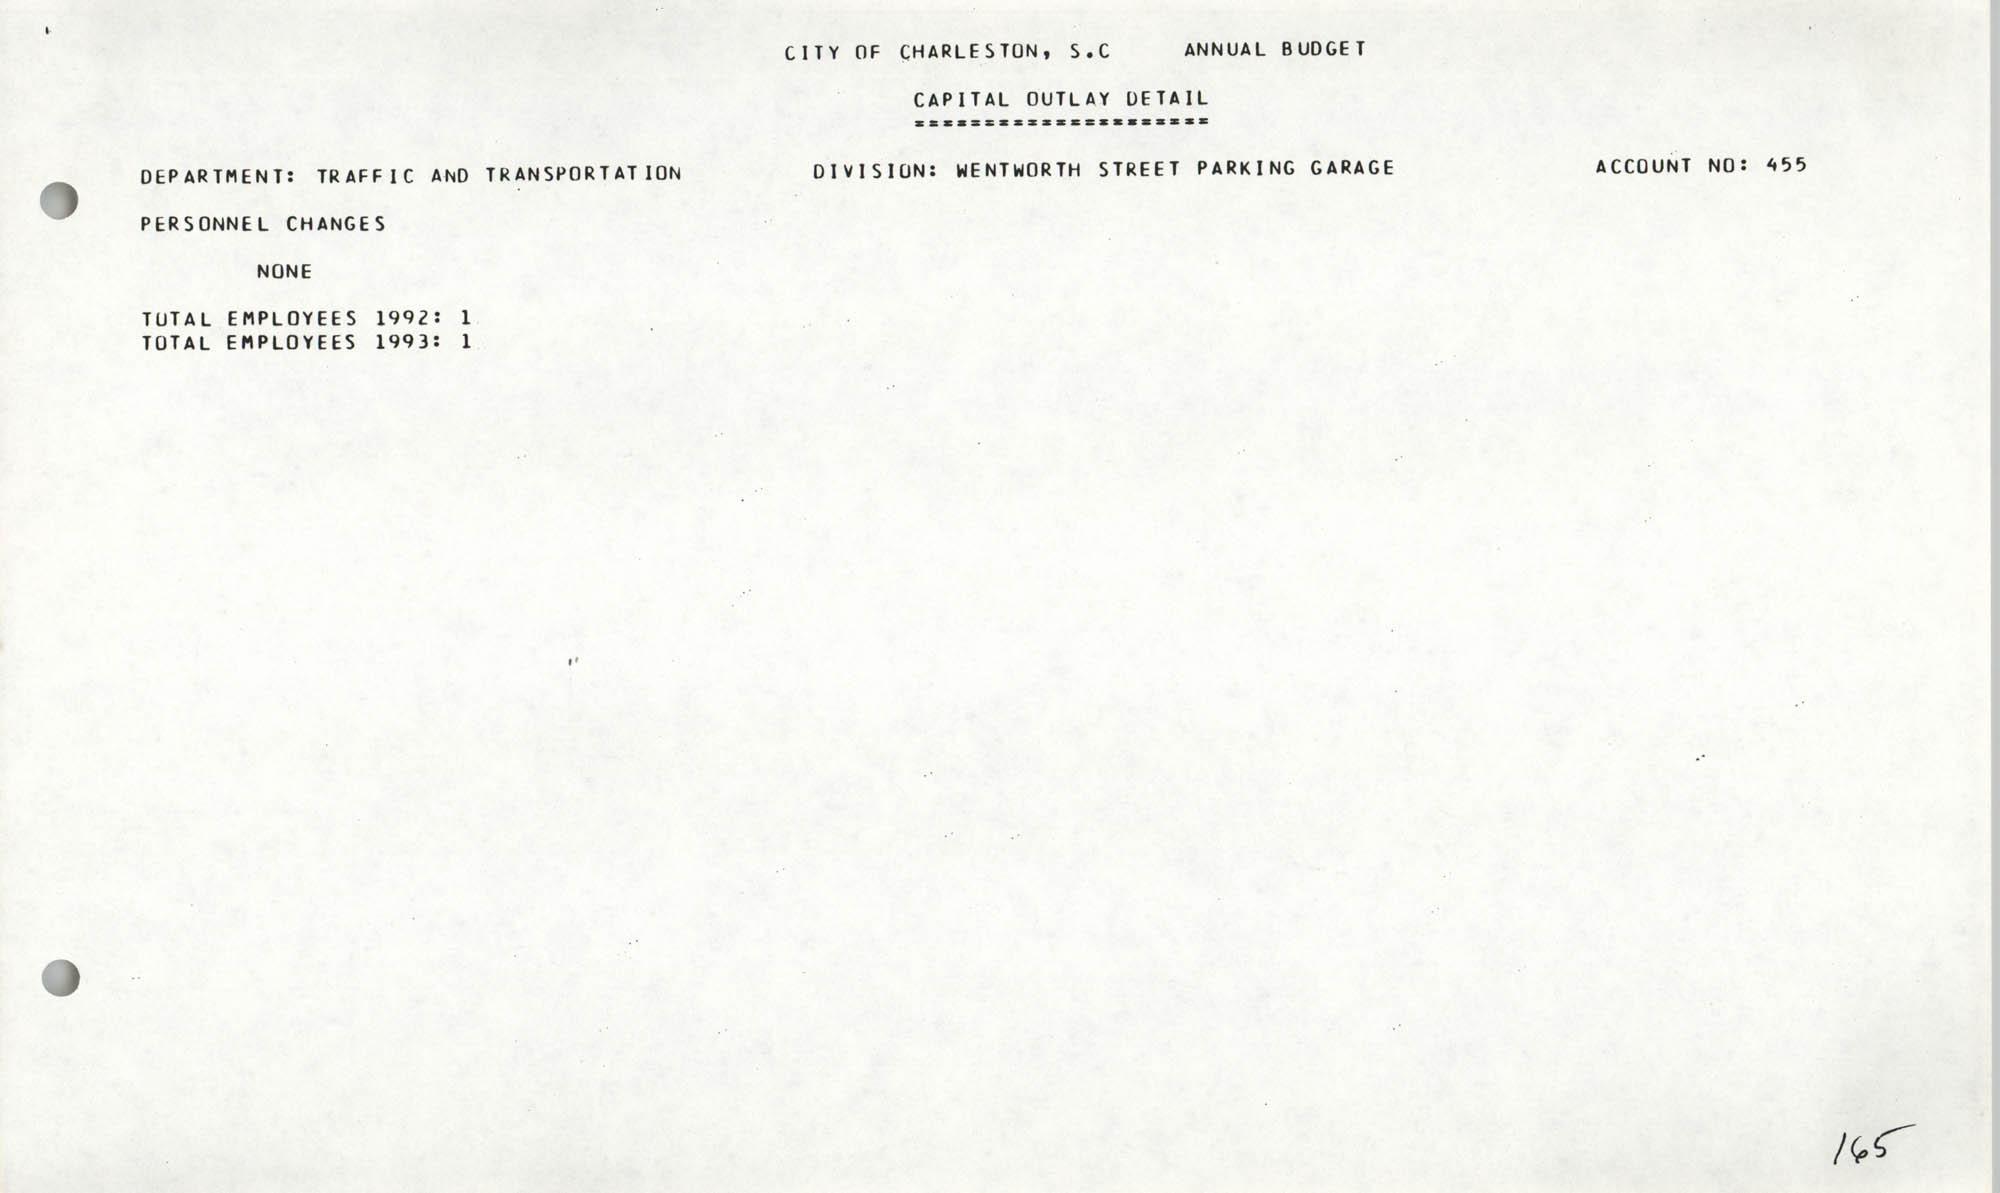 The City Council of Charleston, South Carolina, 1993 Budget, Page 165